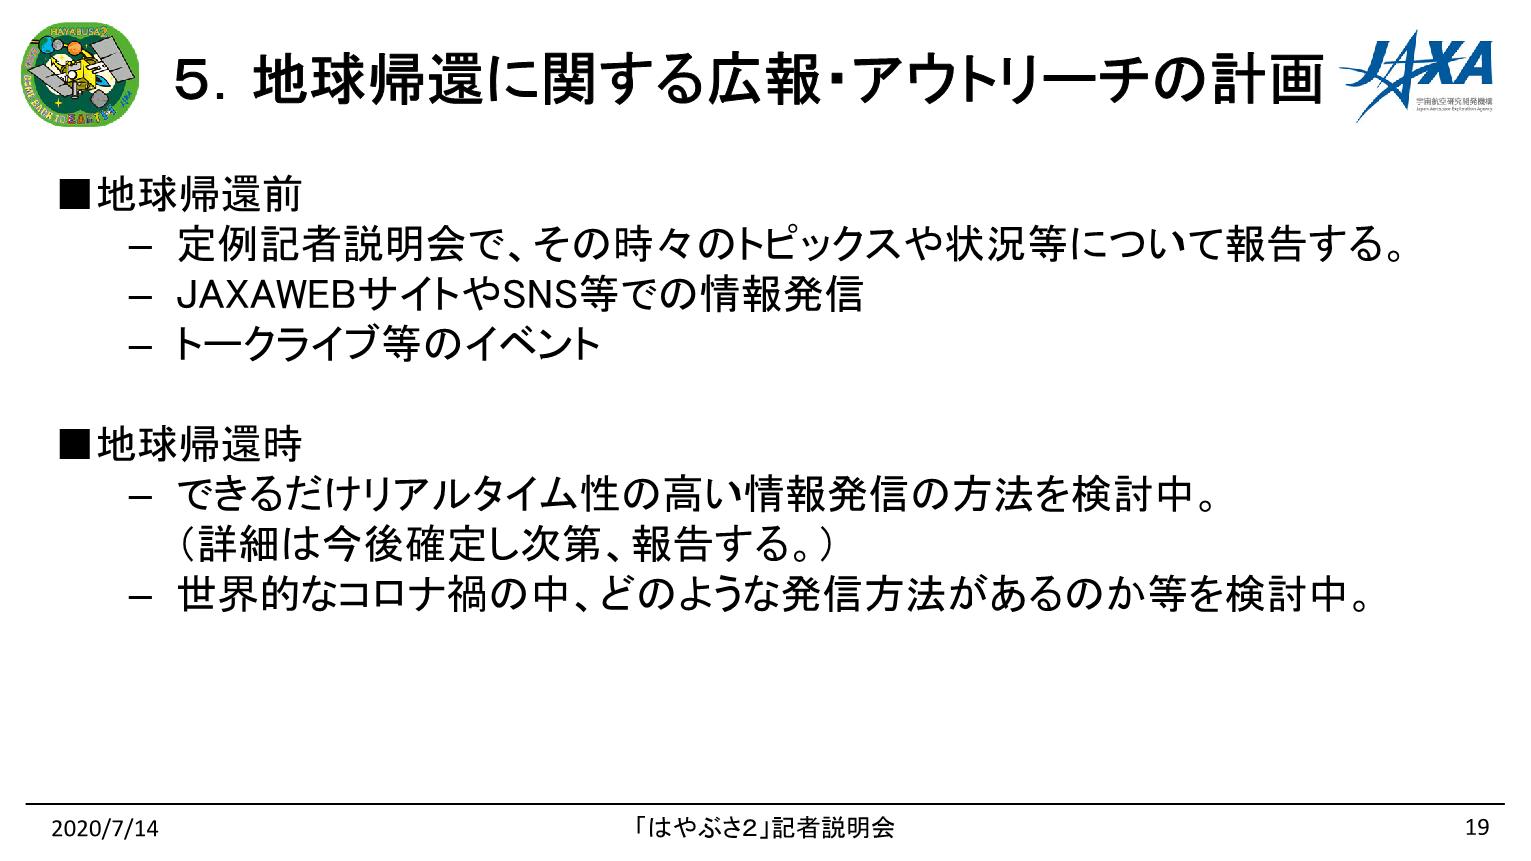 f:id:Imamura:20200714230352p:plain